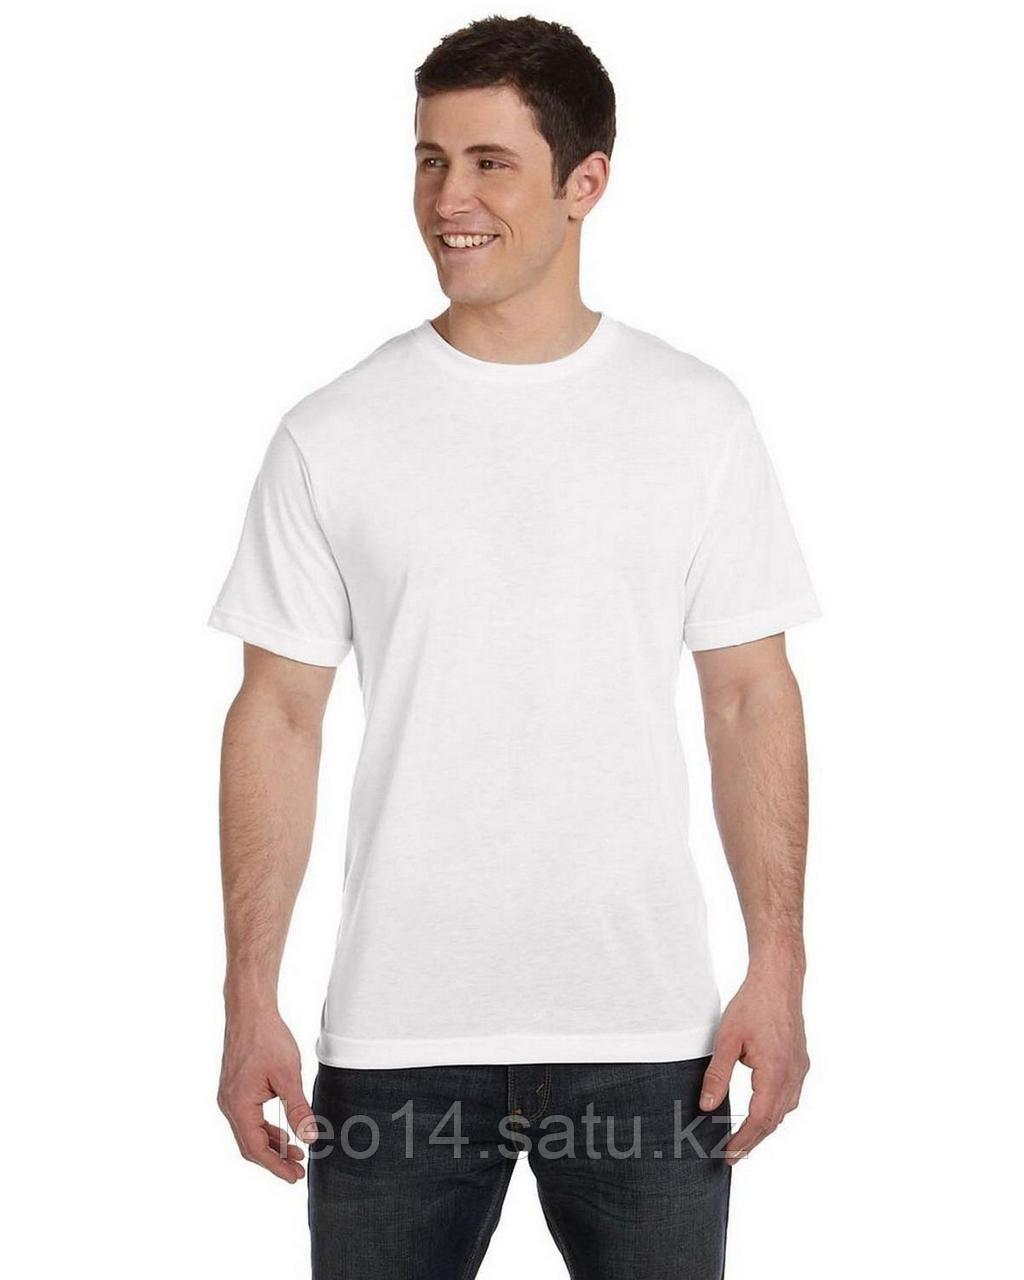 "Футболка ""Джерси 140"" 40 (3XS) ""Unisex"" цвет: белый"